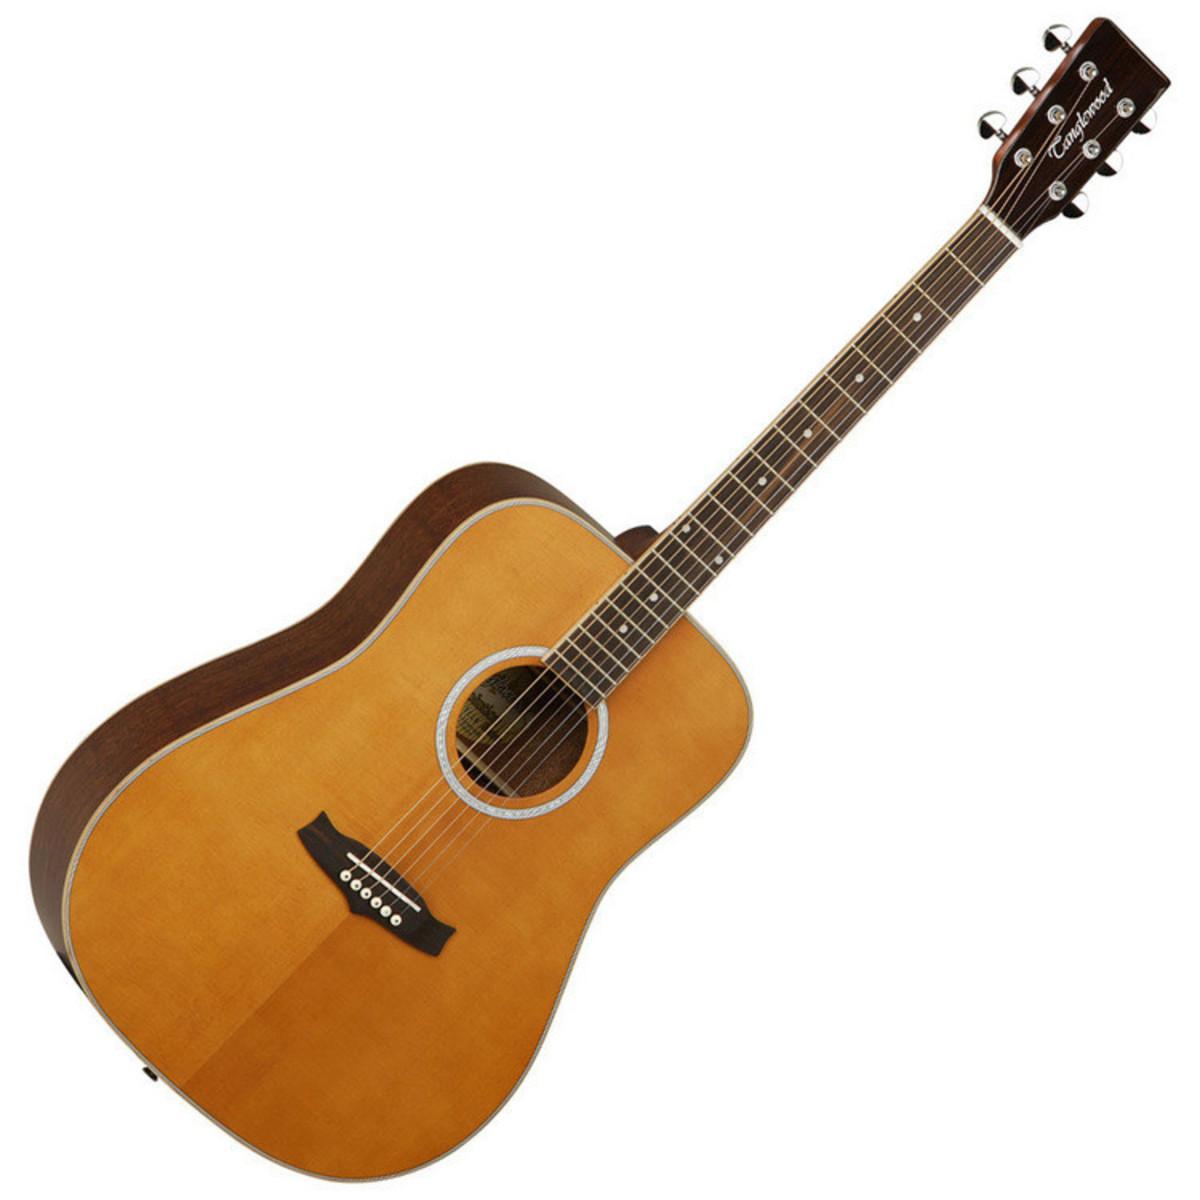 disc tanglewood evolution tw28 acoustic guitar natural free tuner at. Black Bedroom Furniture Sets. Home Design Ideas